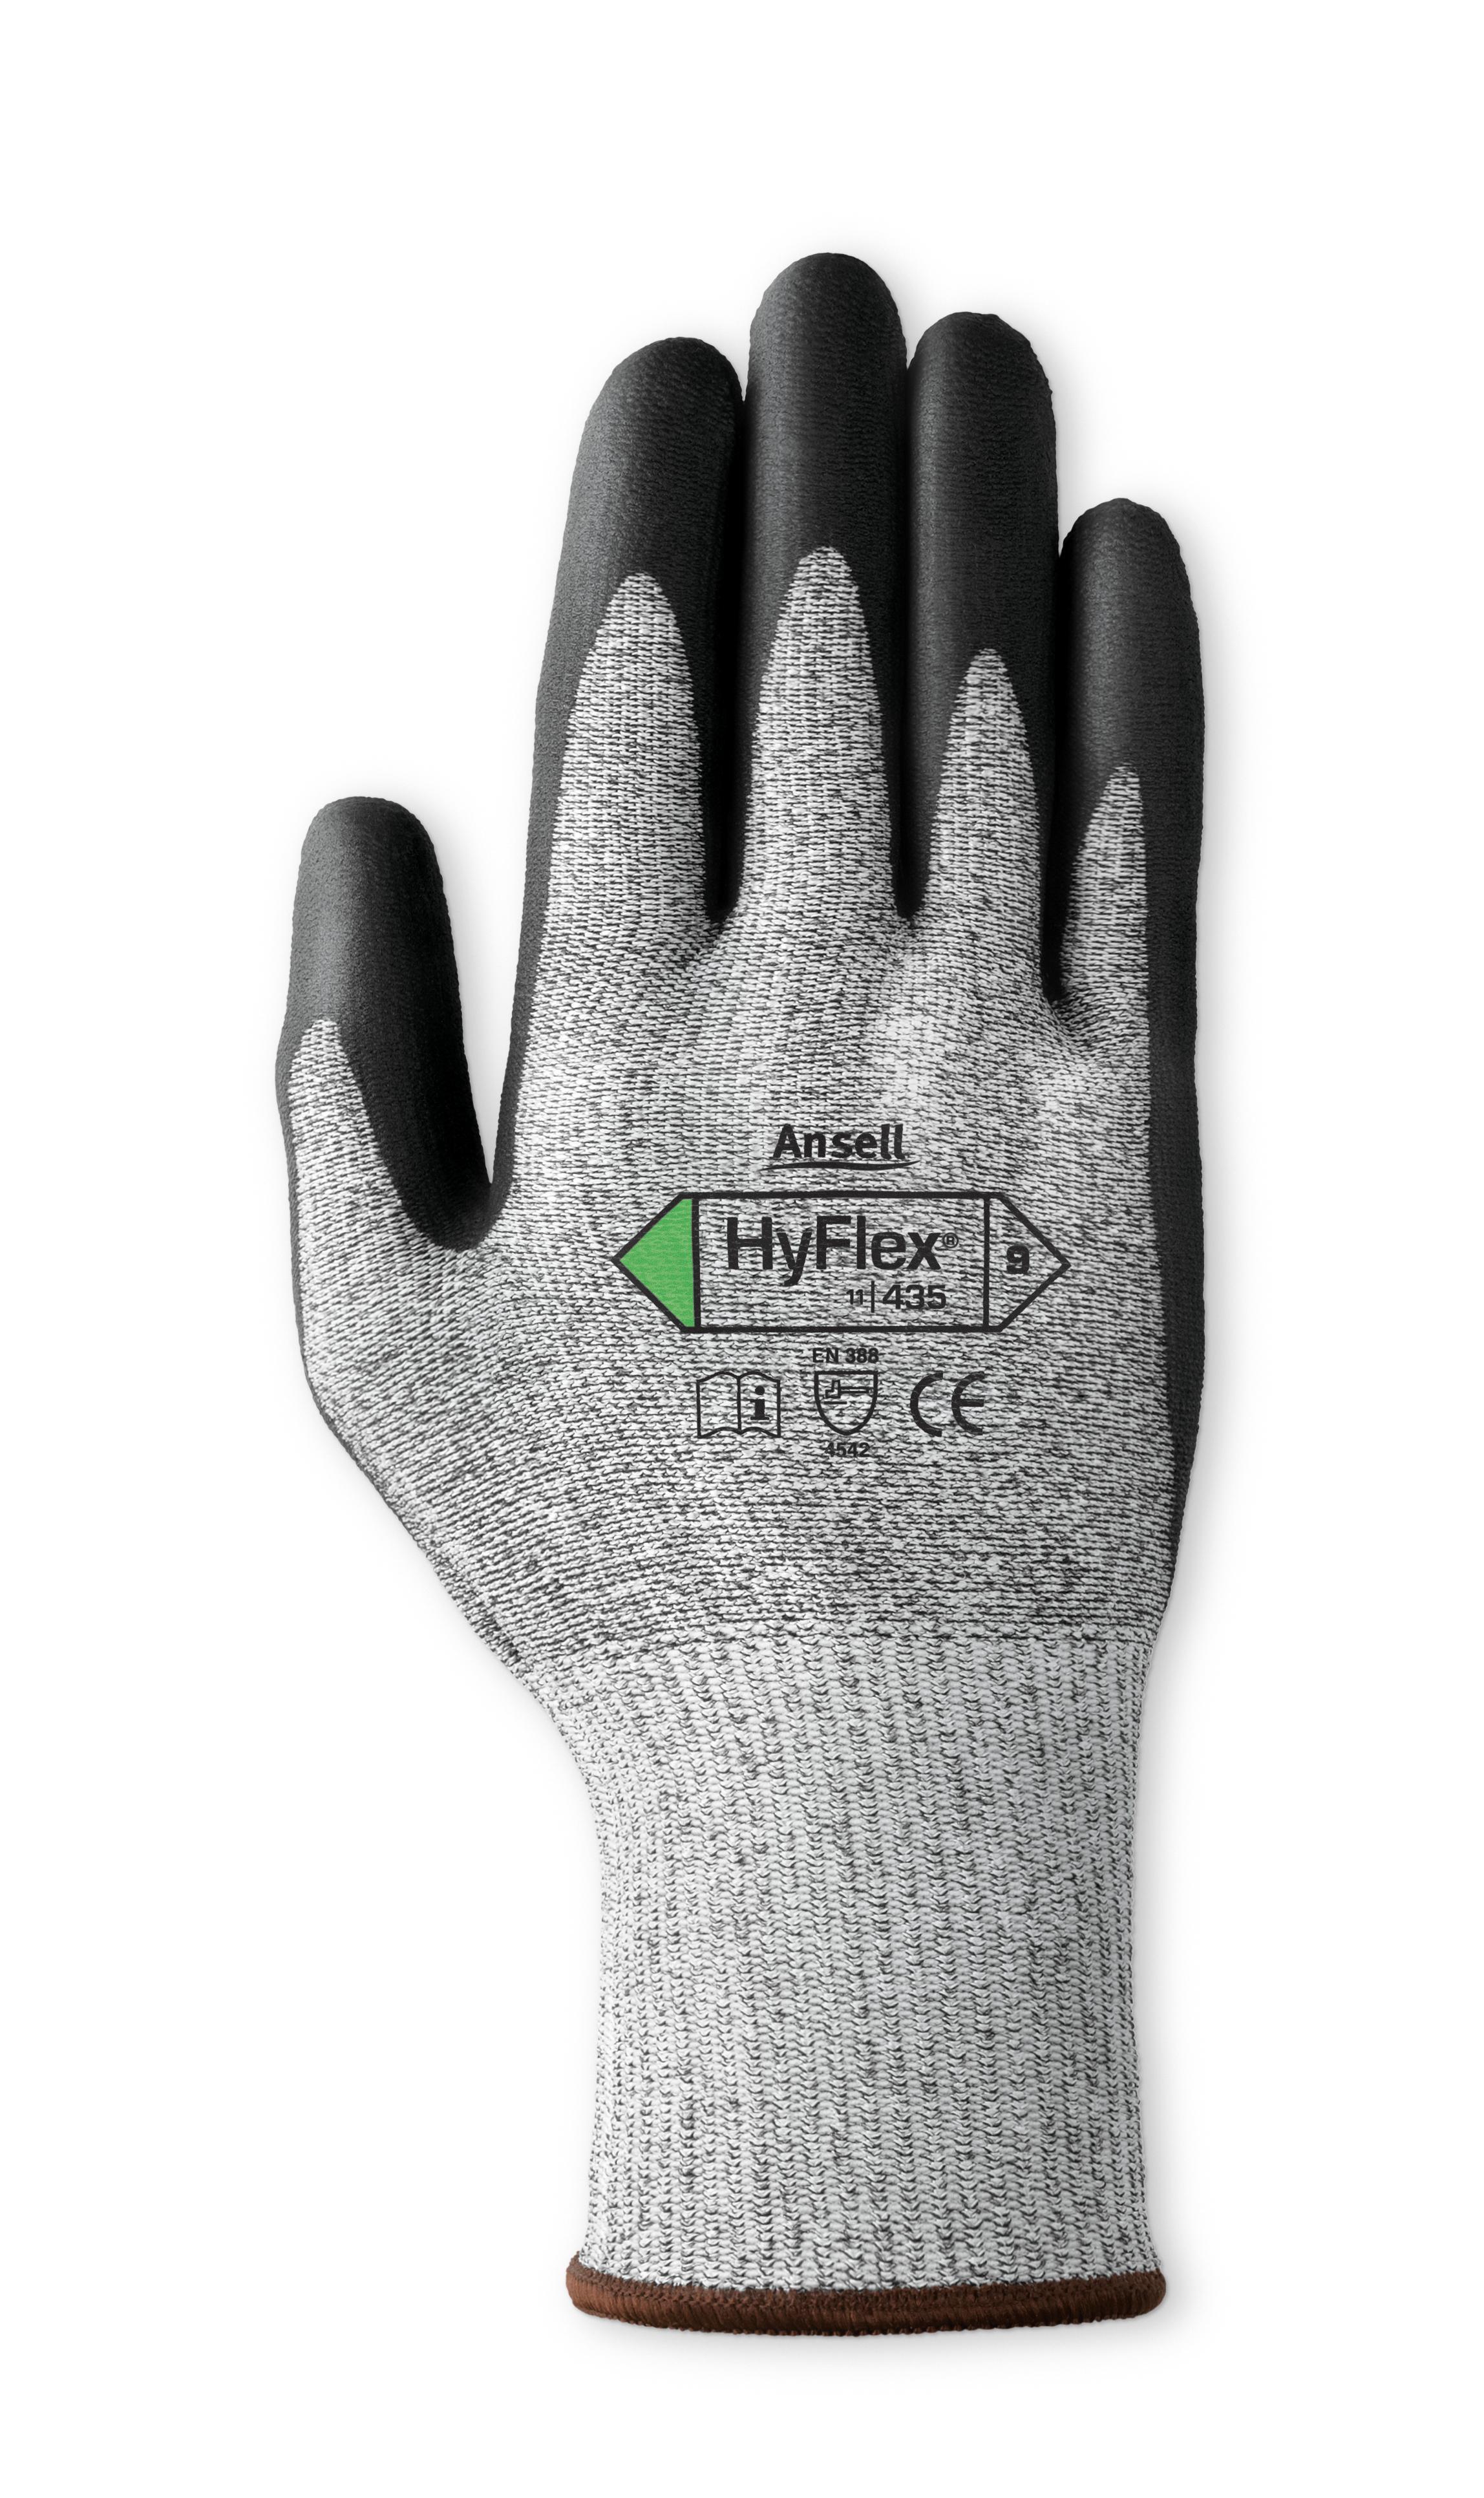 Personal Protective Equipment Gloves Medium Cut